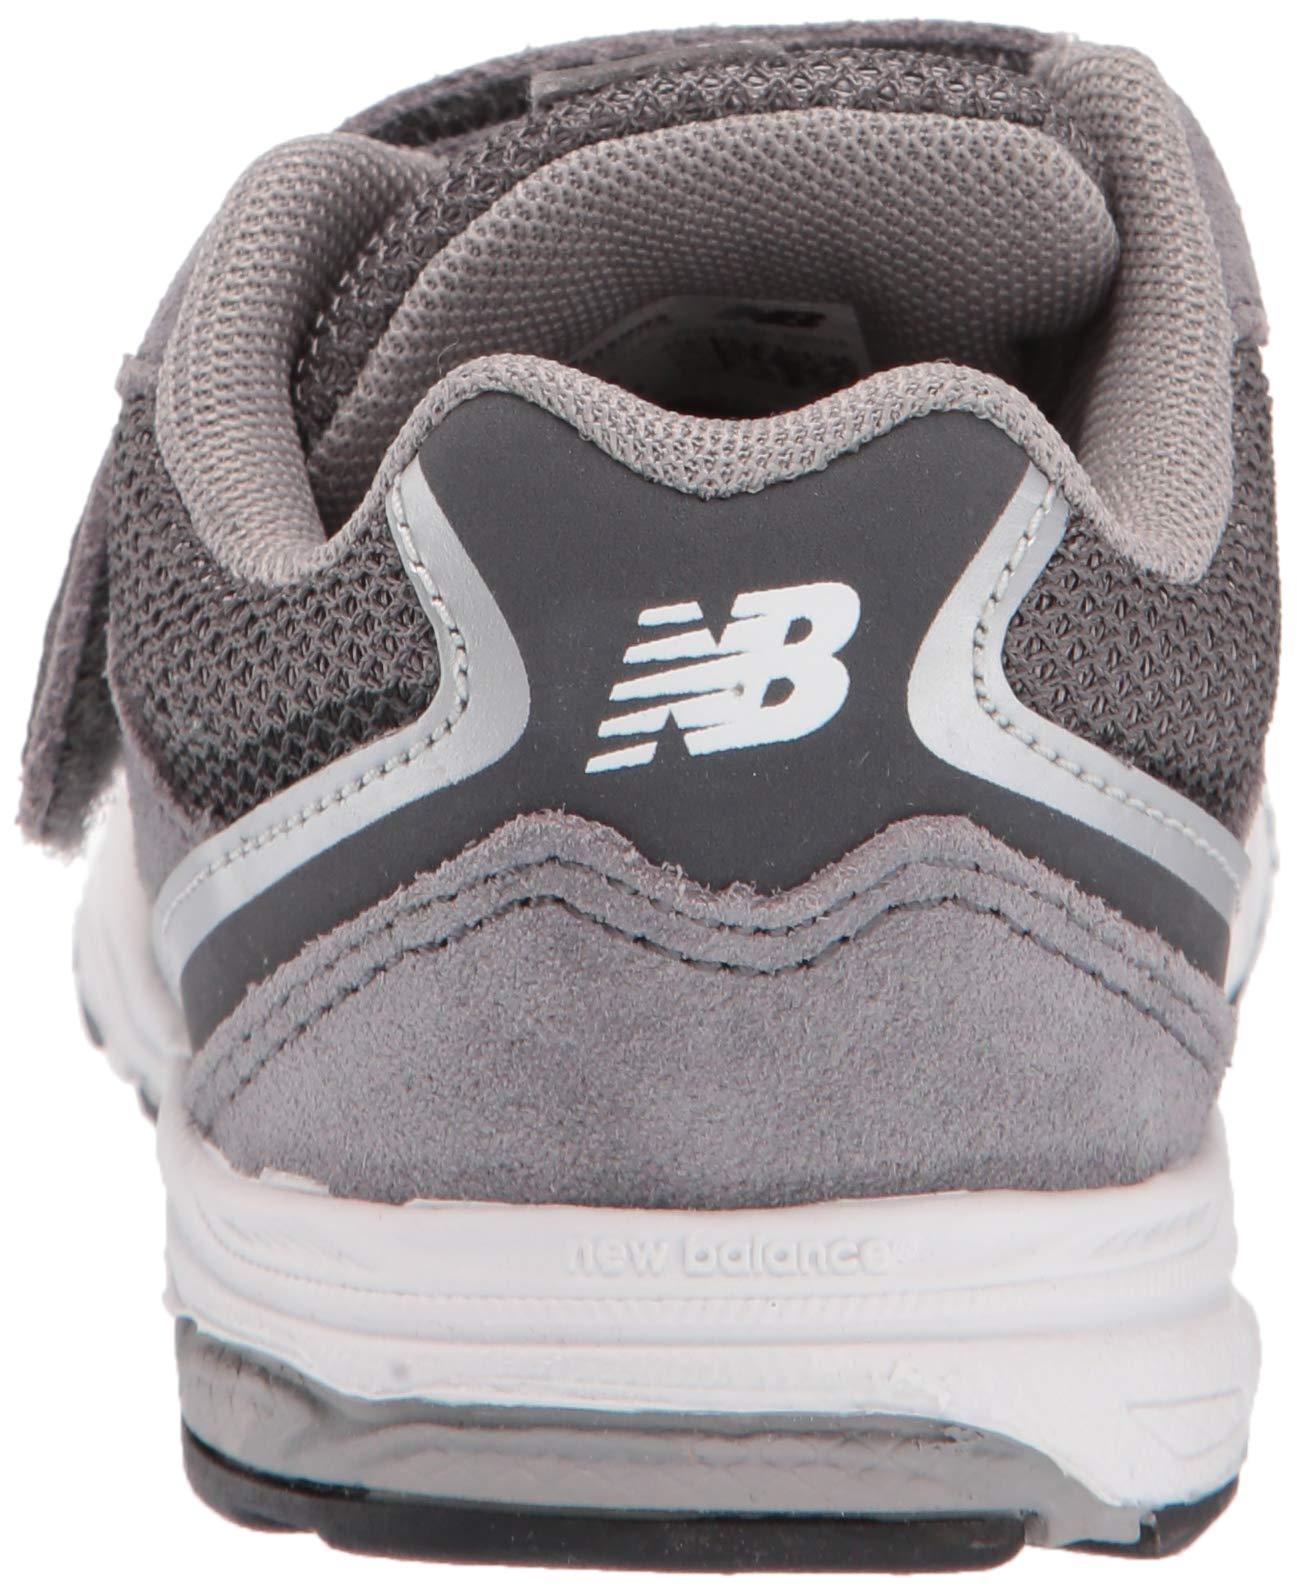 New Balance Boys' 888v2 Hook and Loop Running Shoe, Dark Grey, 2 M US Infant by New Balance (Image #2)